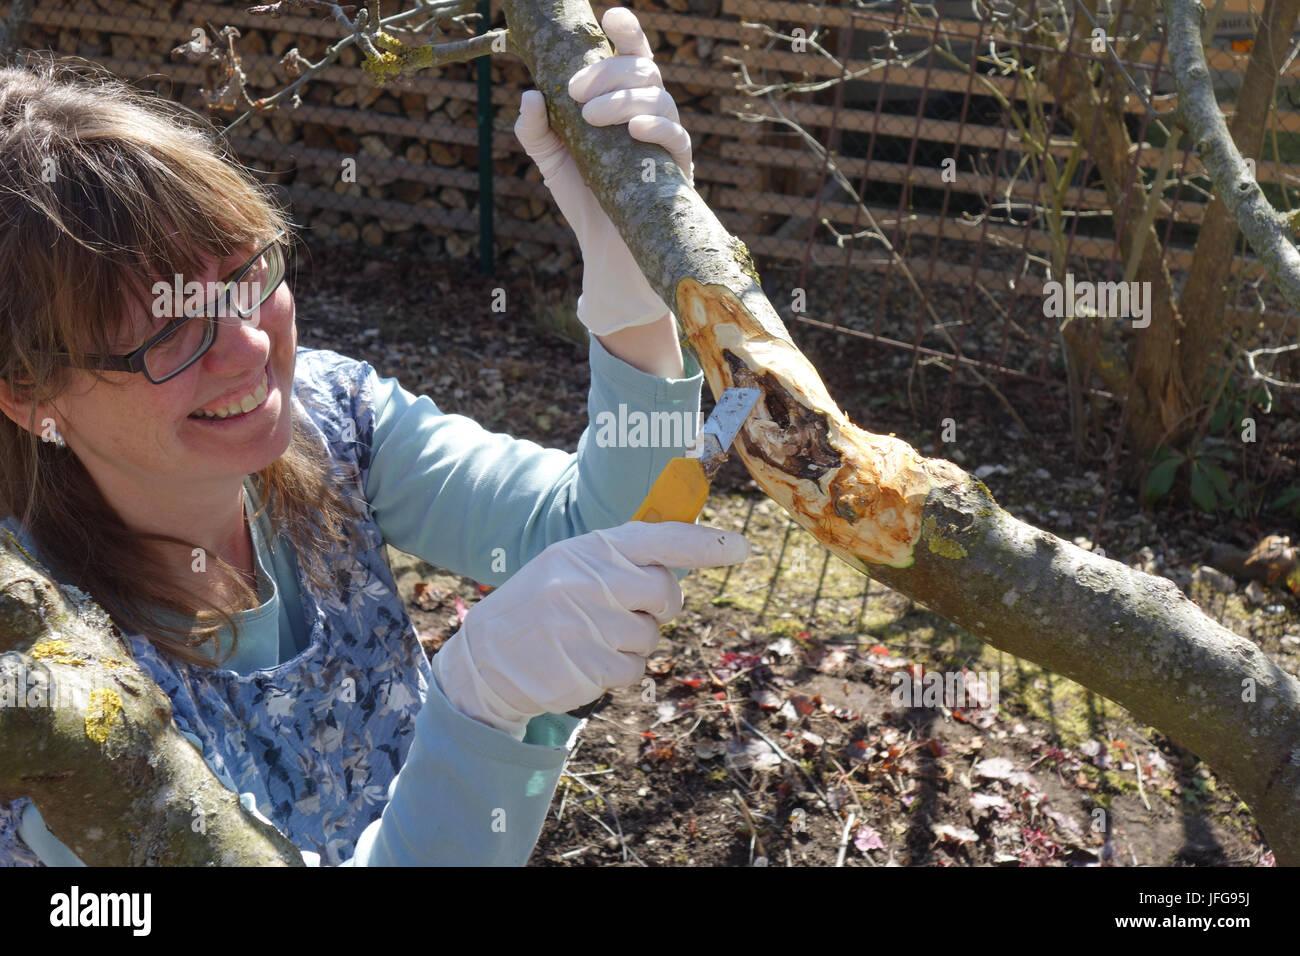 Fruit tree cancer, cut sore - Stock Image